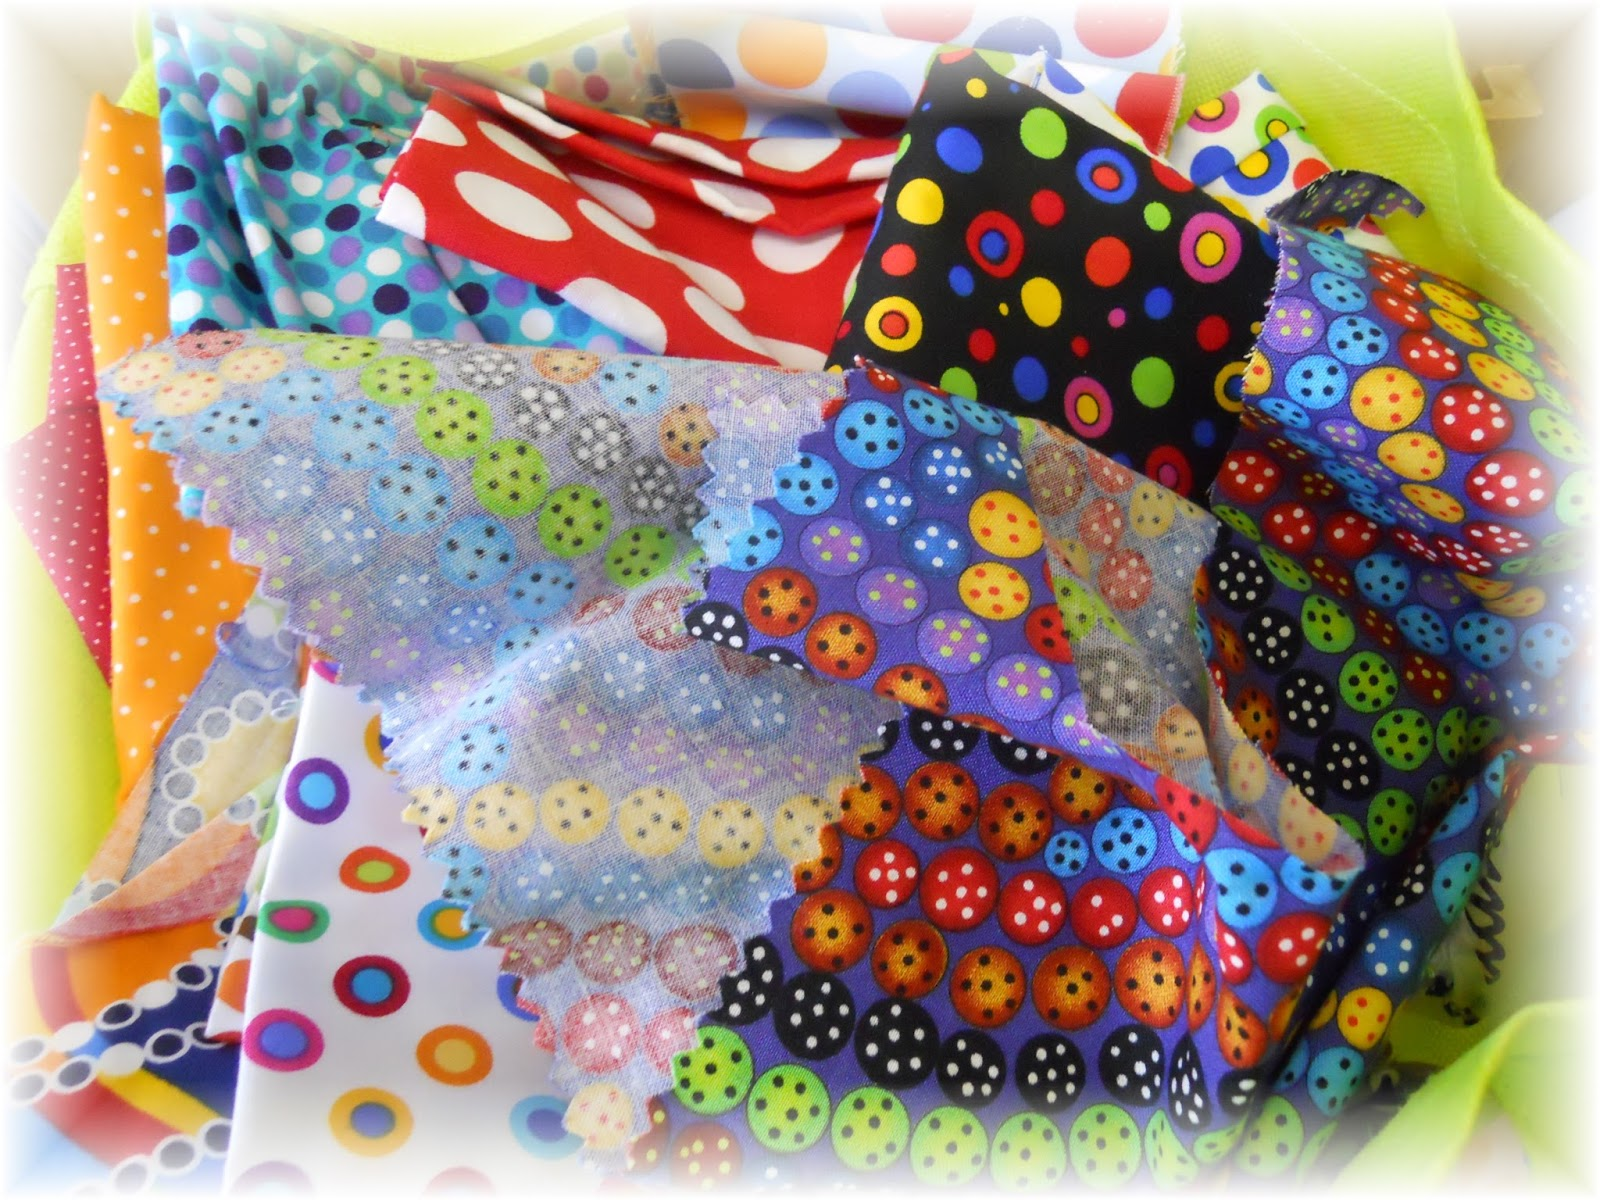 Stofsnippers kleur je leven - Kleur associatie ...